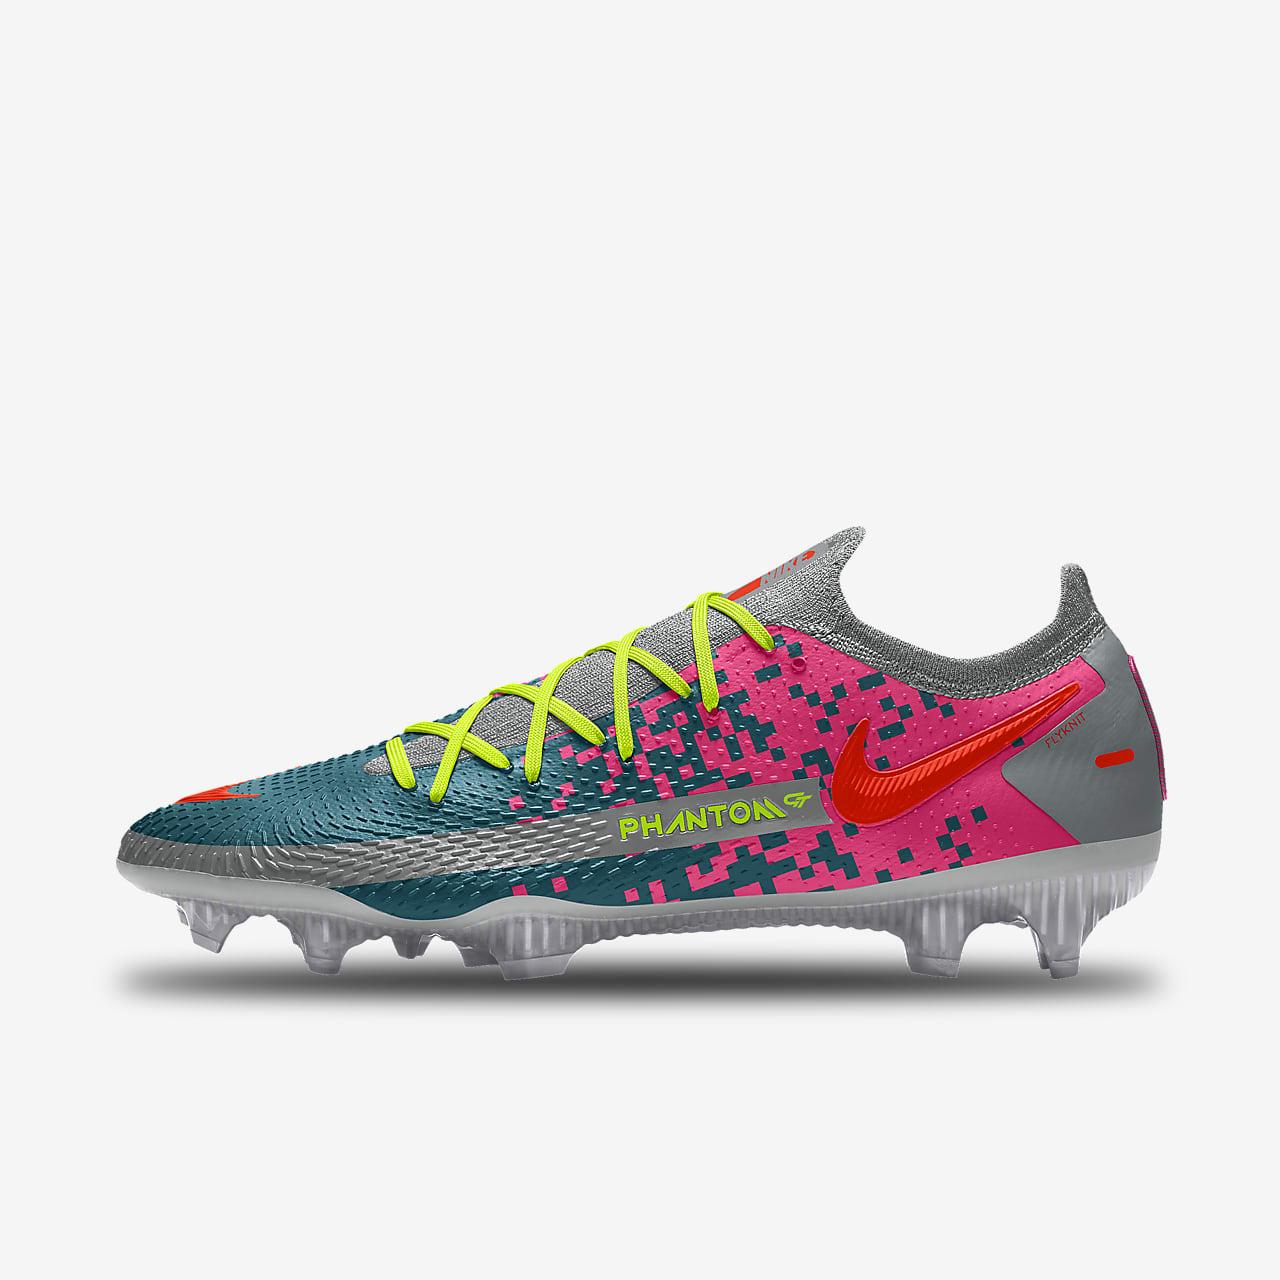 Specialdesignad fotbollssko för gräs Nike Phantom GT Elite By You